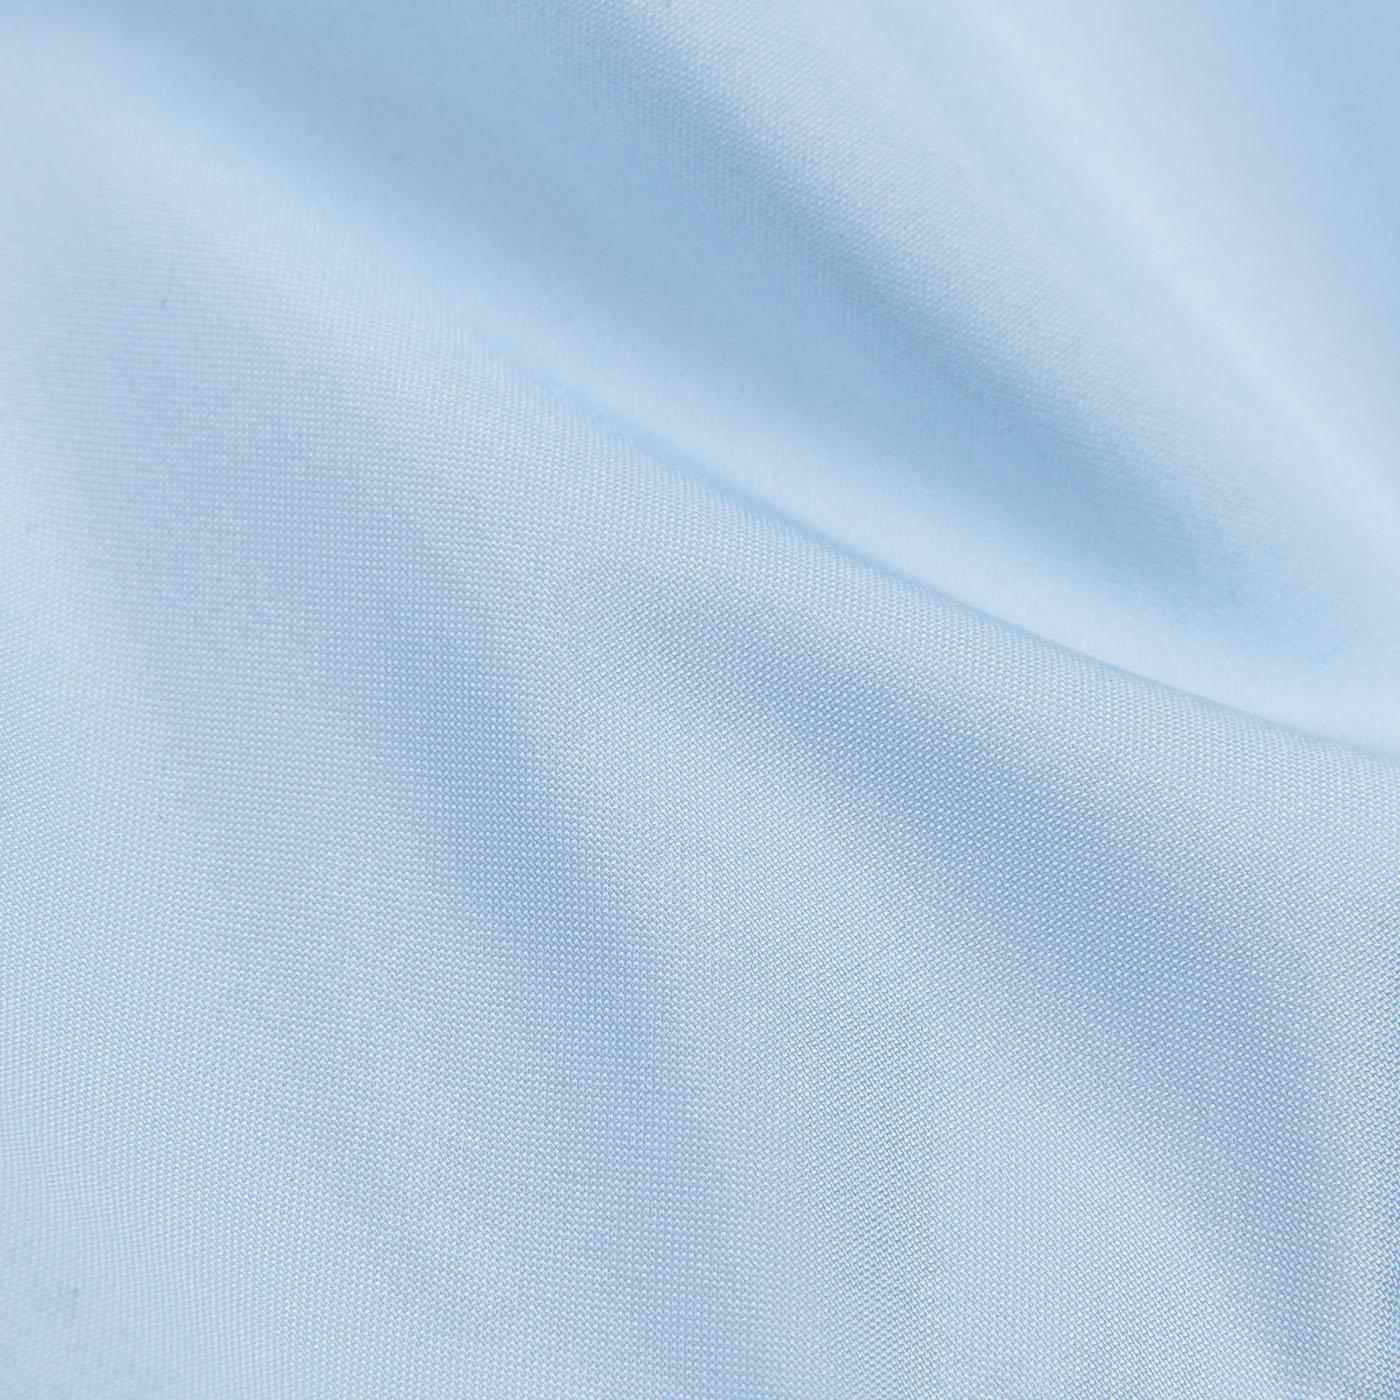 Fedeli Sky Blue Madeira Microfiber Swim Shorts Fabric